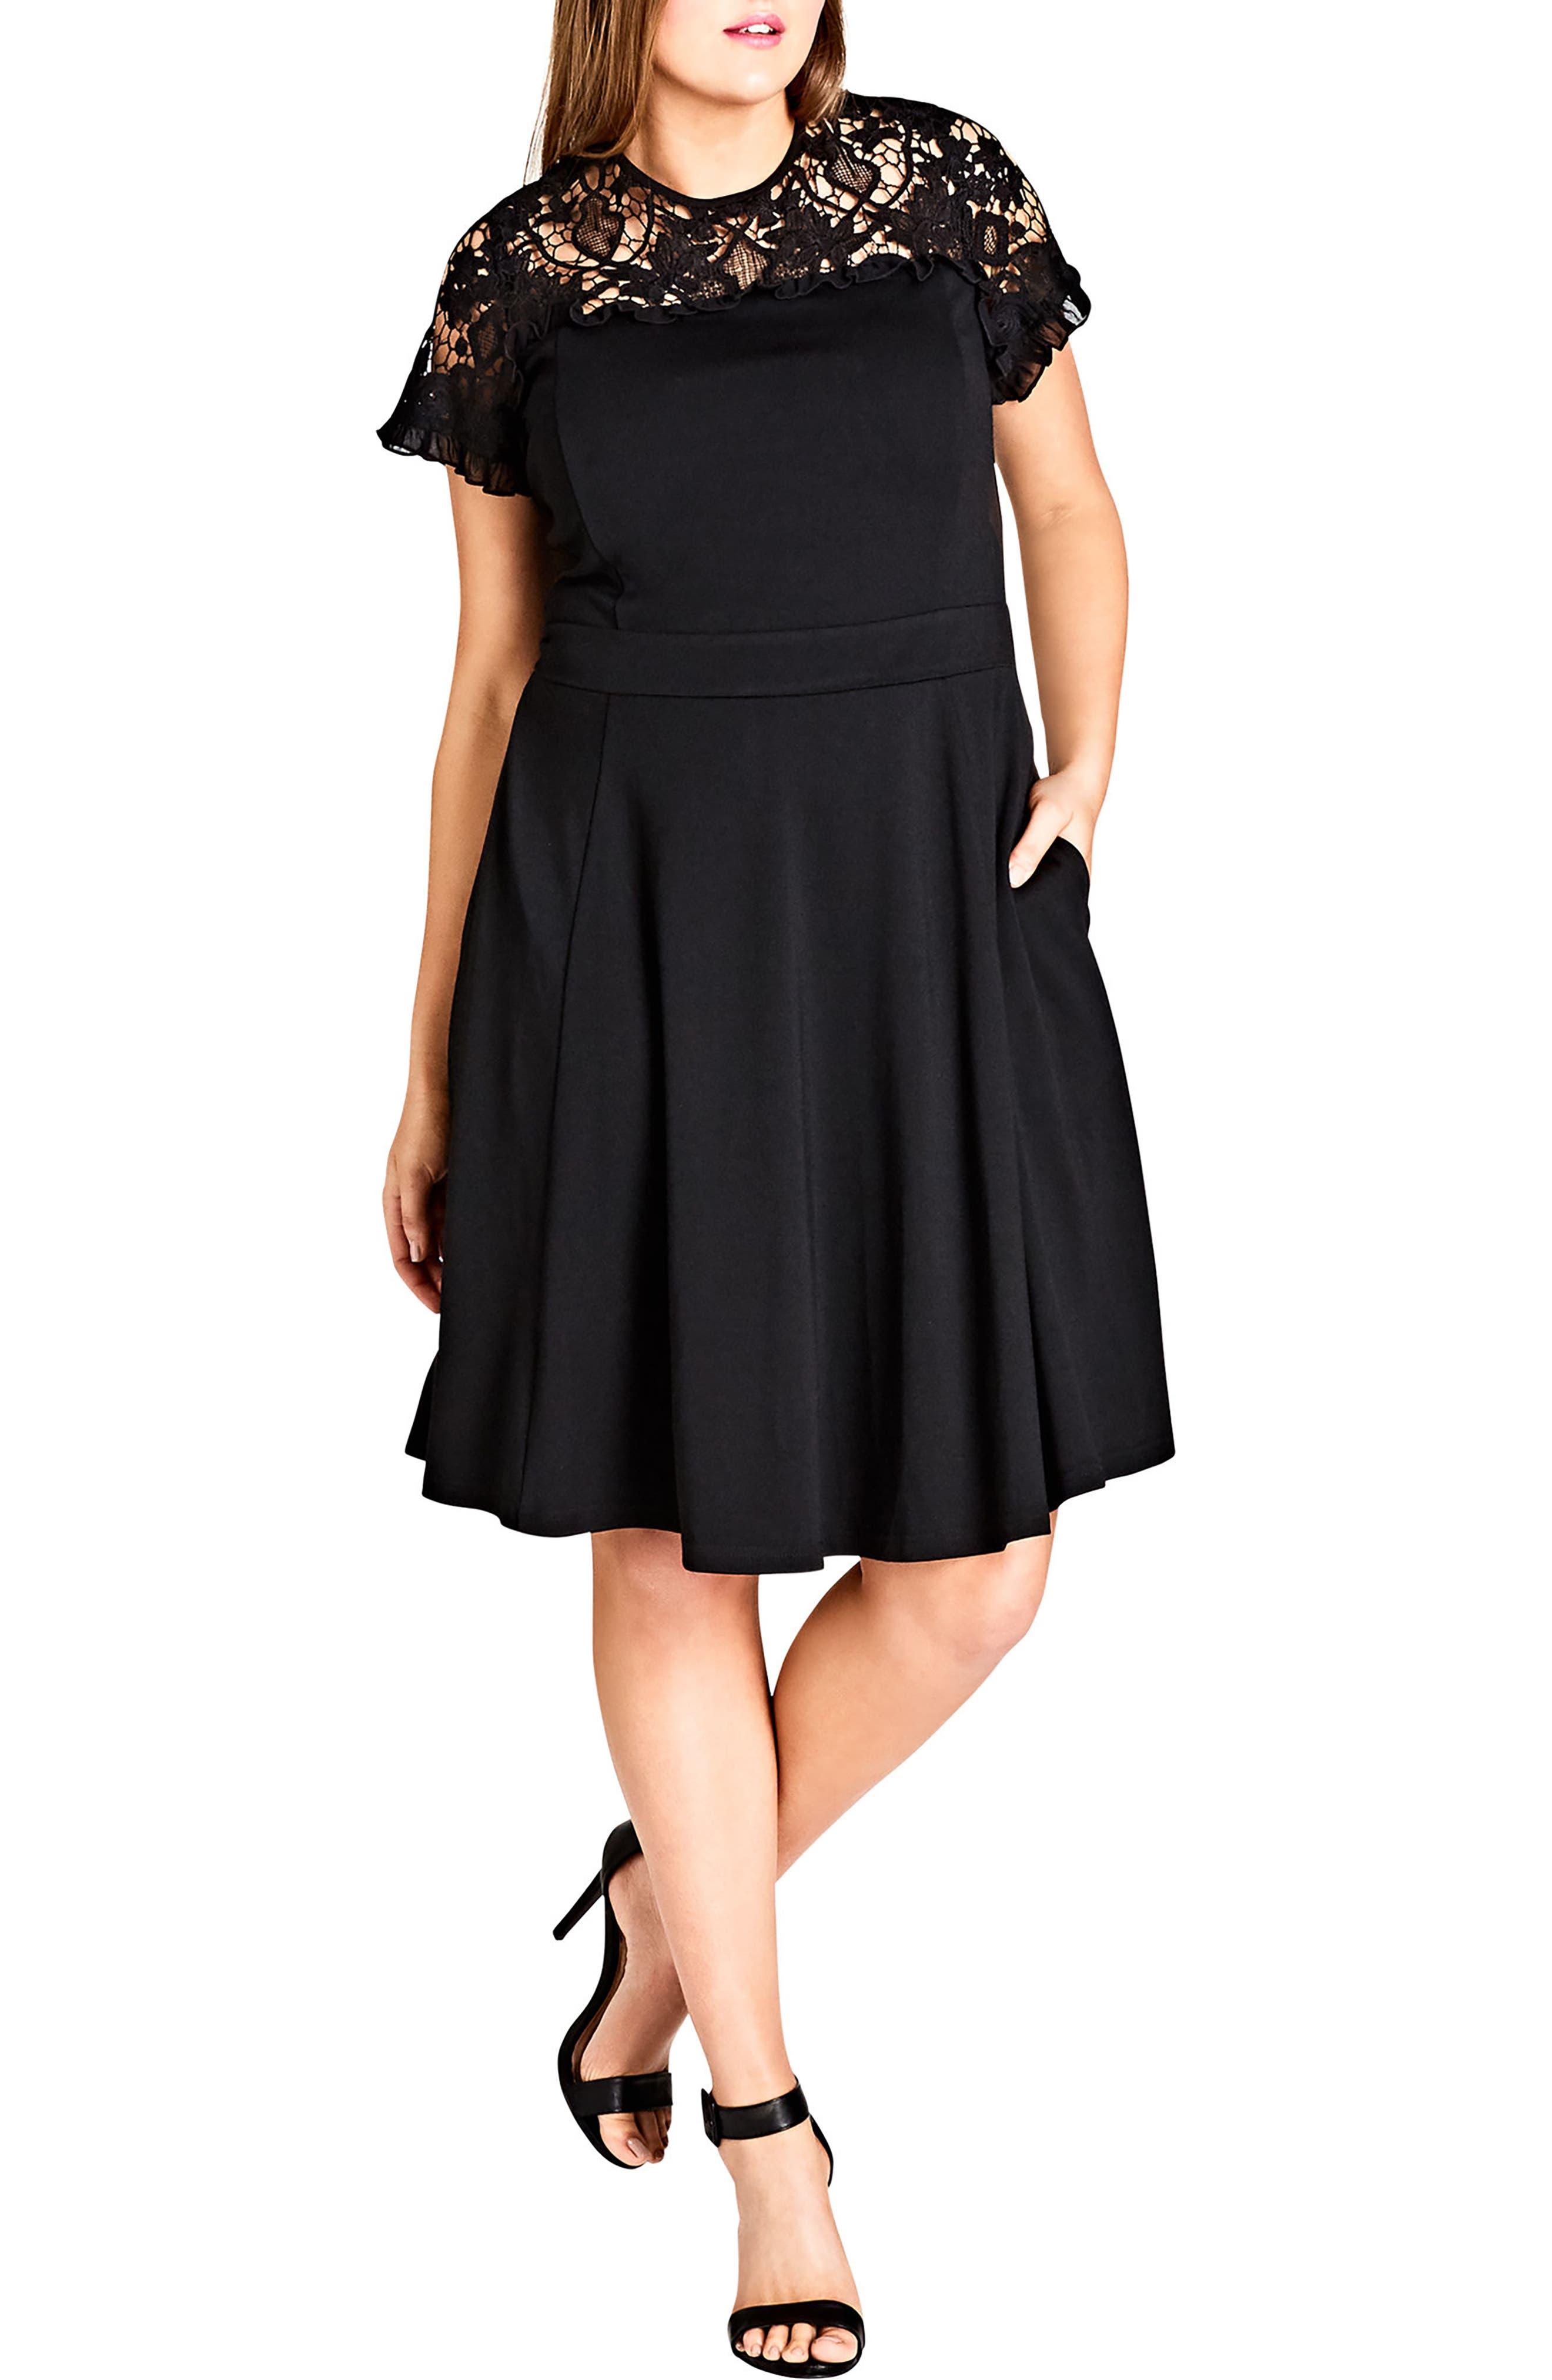 CITY CHIC Dark Mistress Lace Yoke A-Line Dress, Main, color, 014